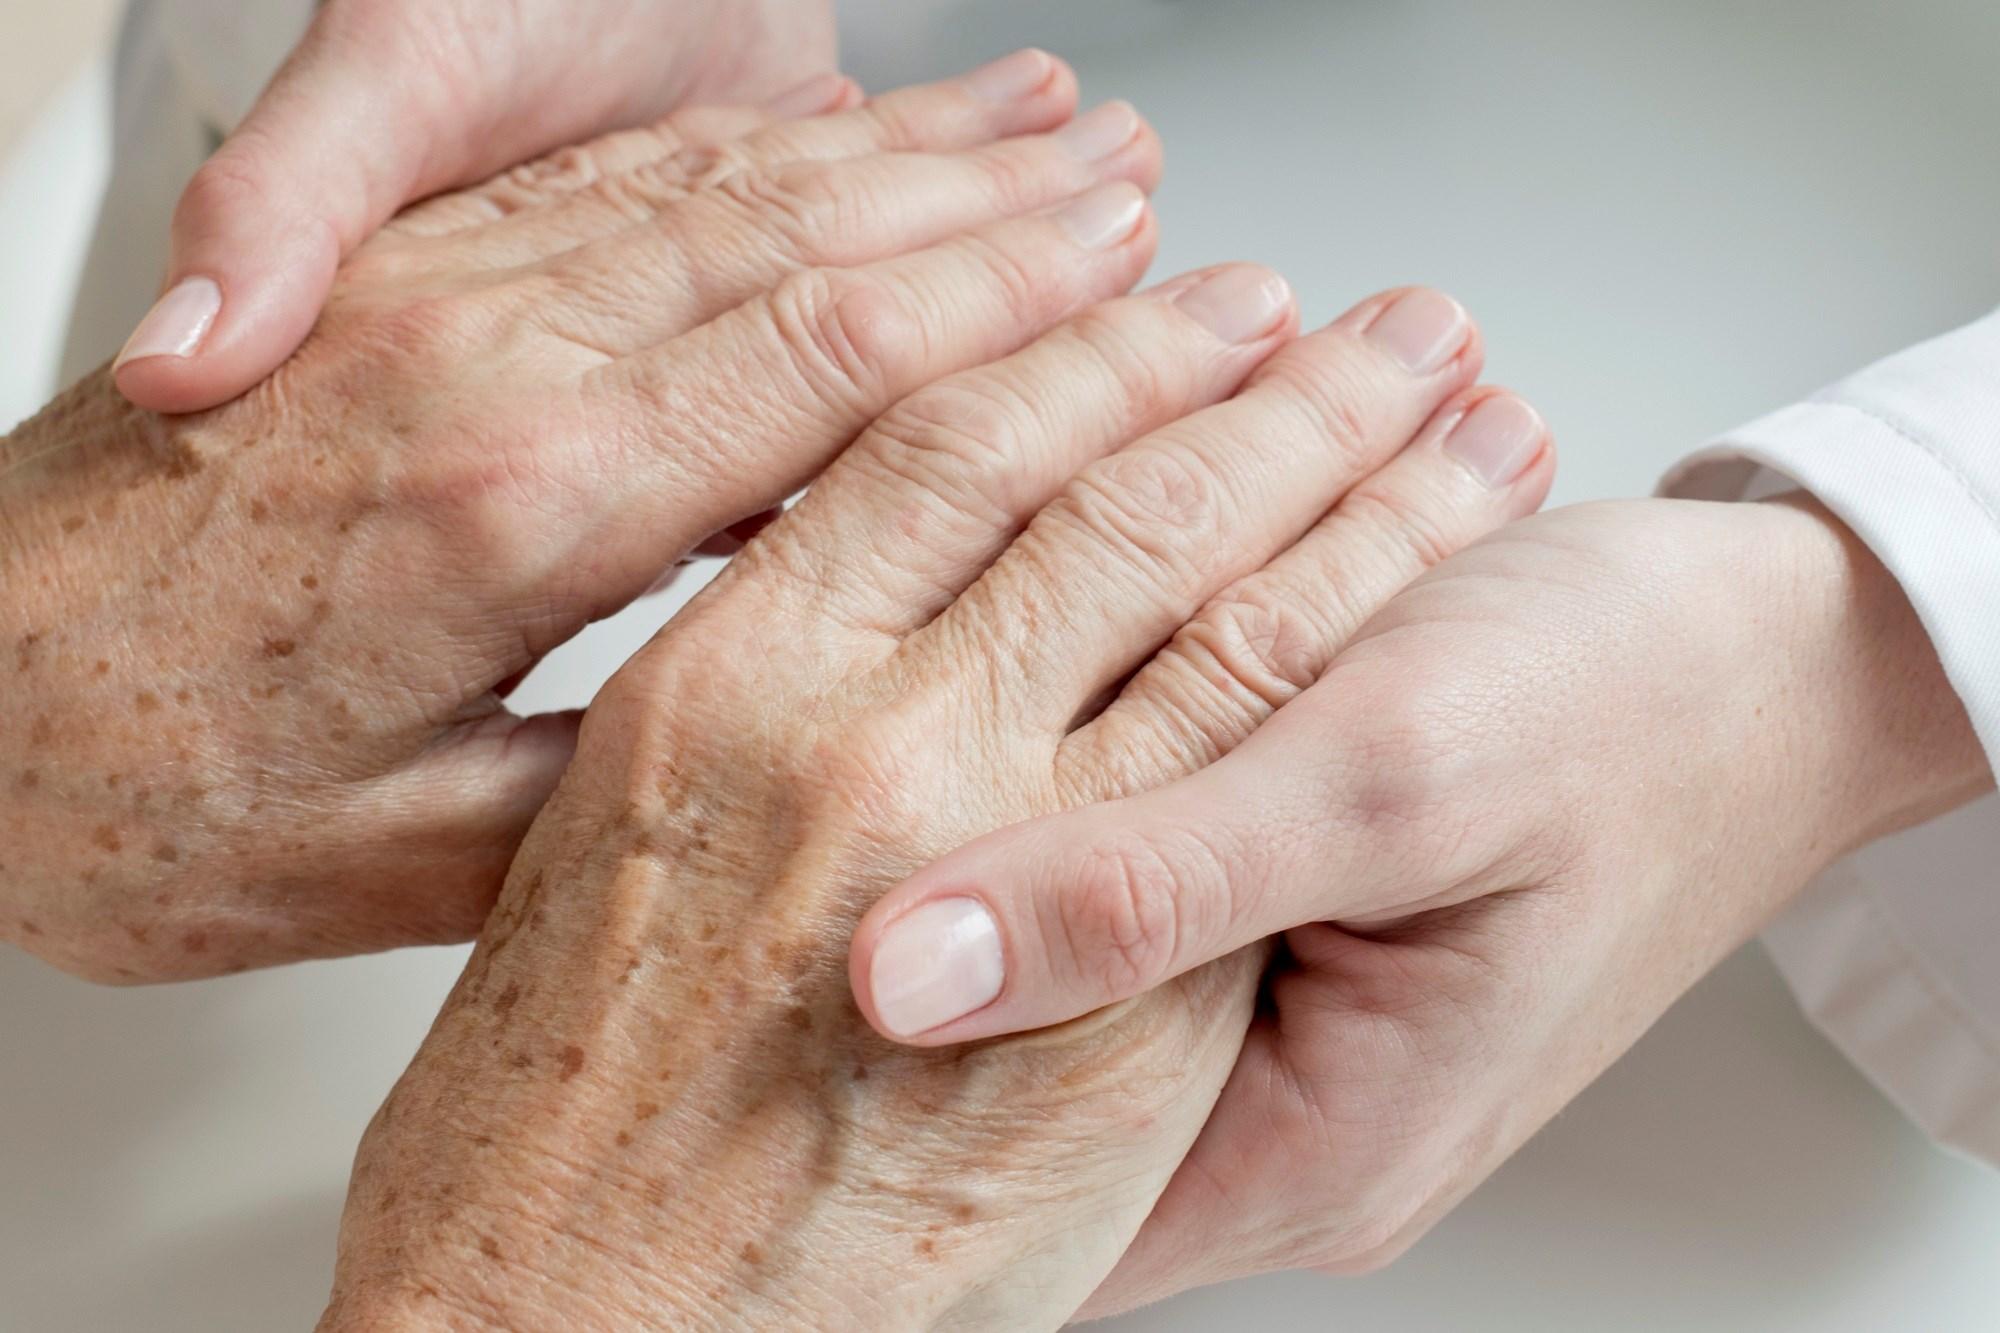 VAT Score Improves Predictive Value of Mini-Mental State Examination for Dementia